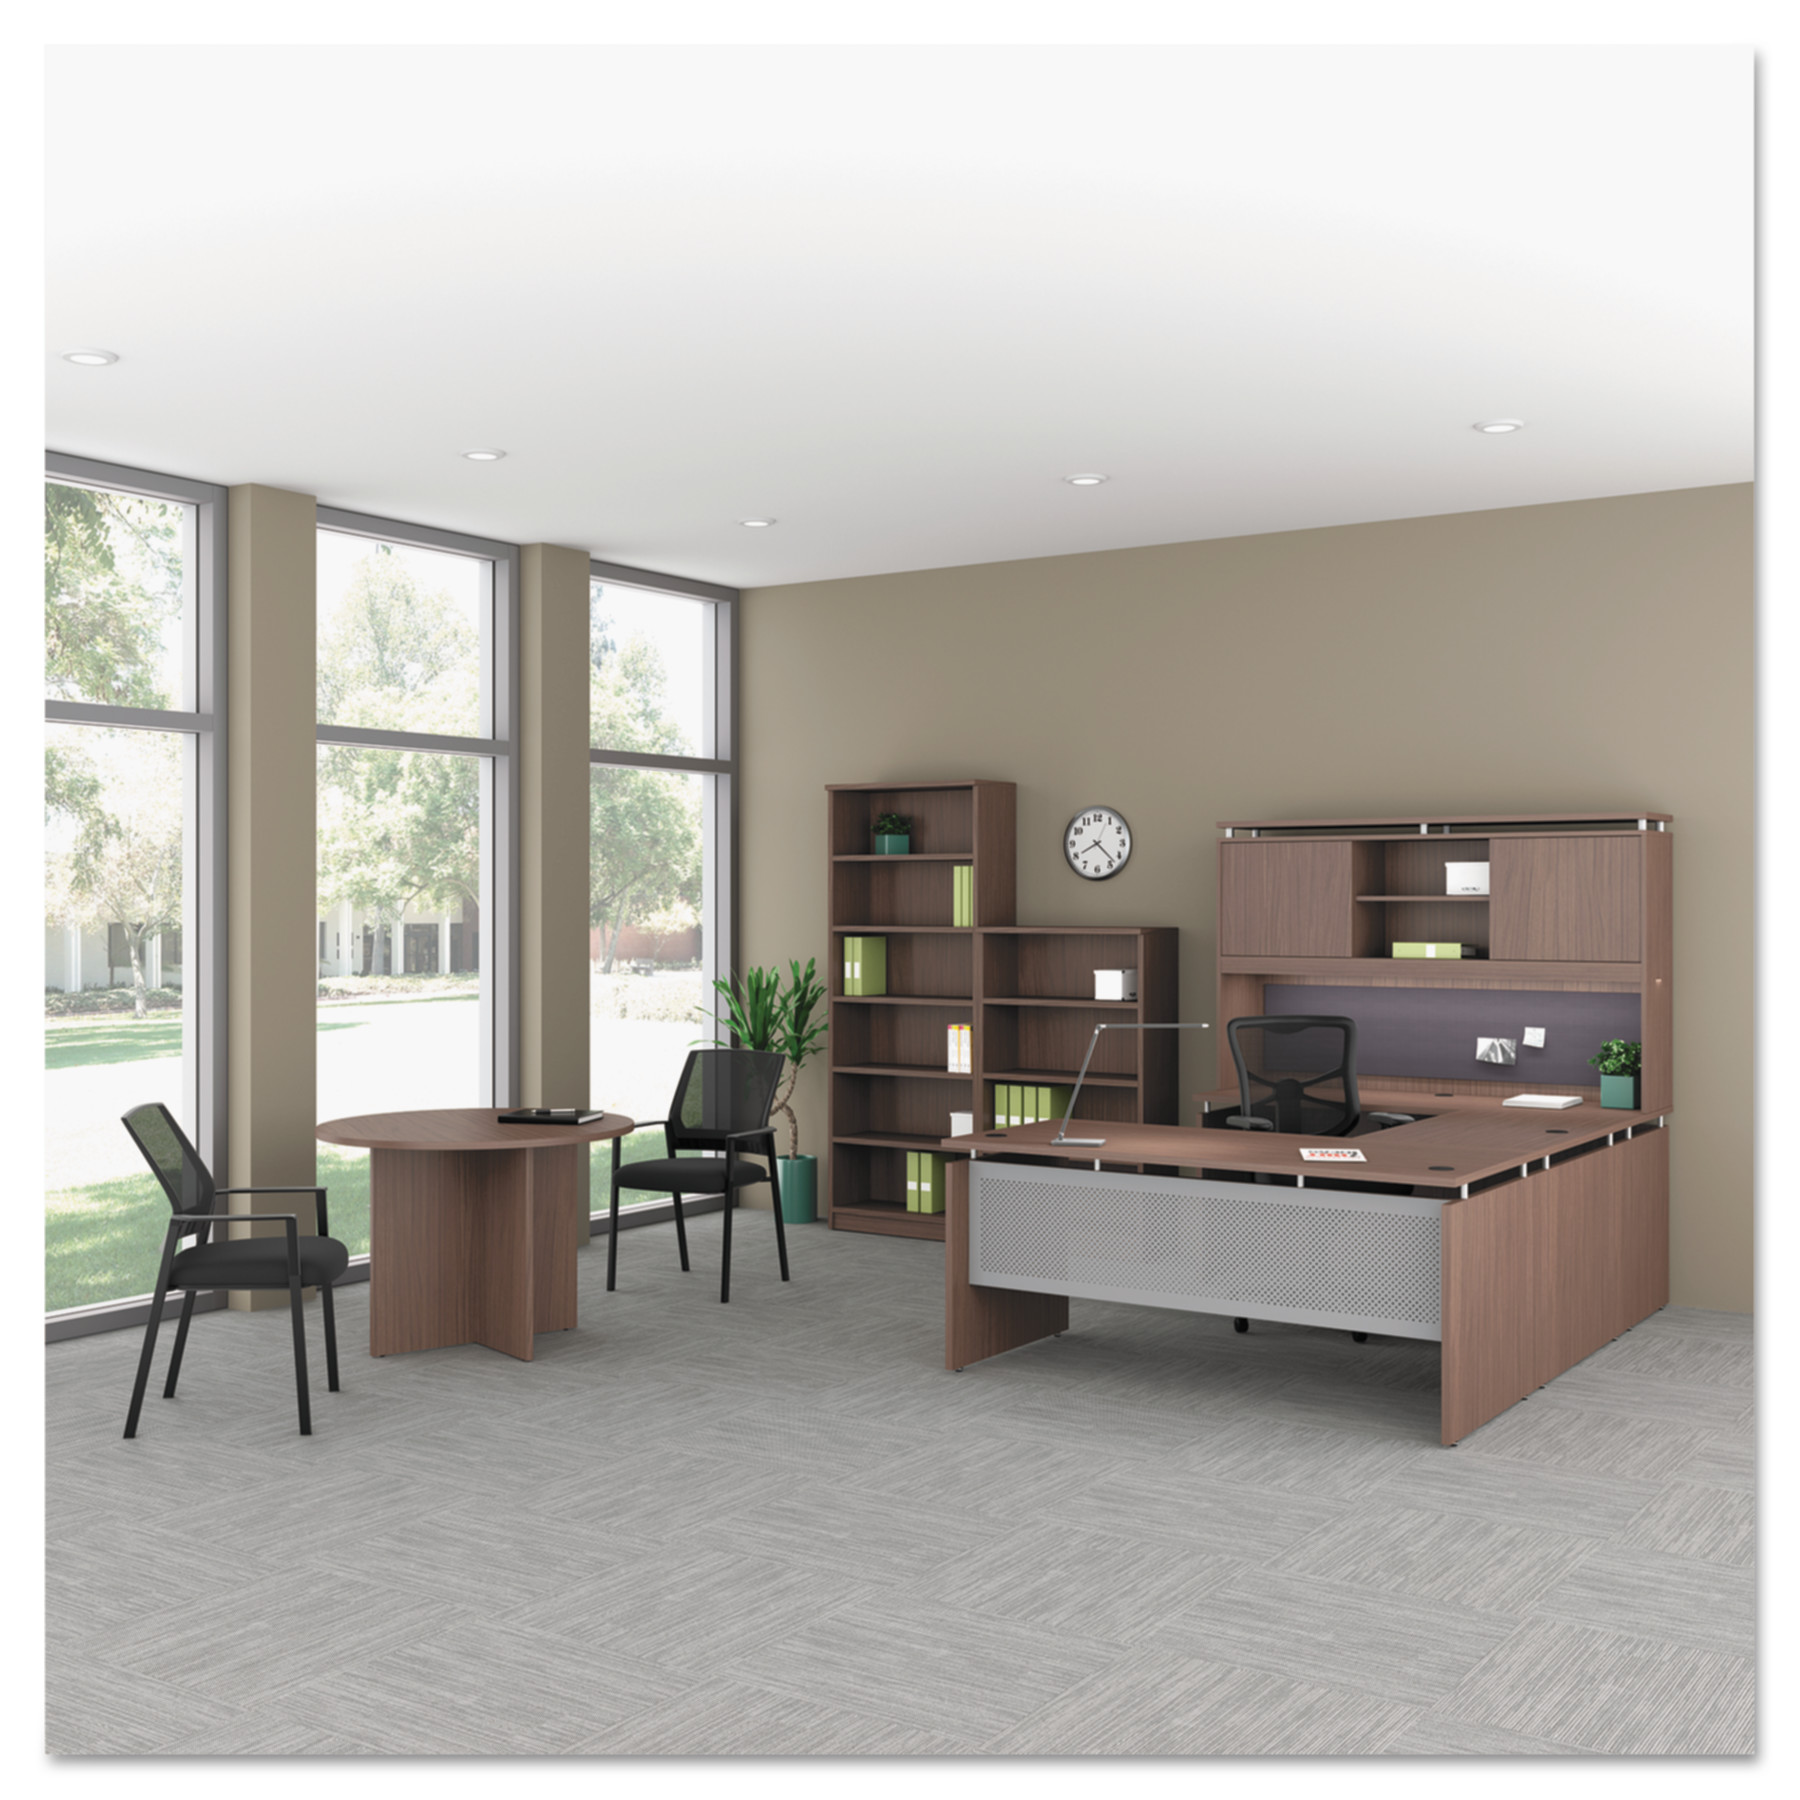 Alera Sedina Series Straight Front Desk Shell, 66w x 30d x 29 1/2h, Espresso